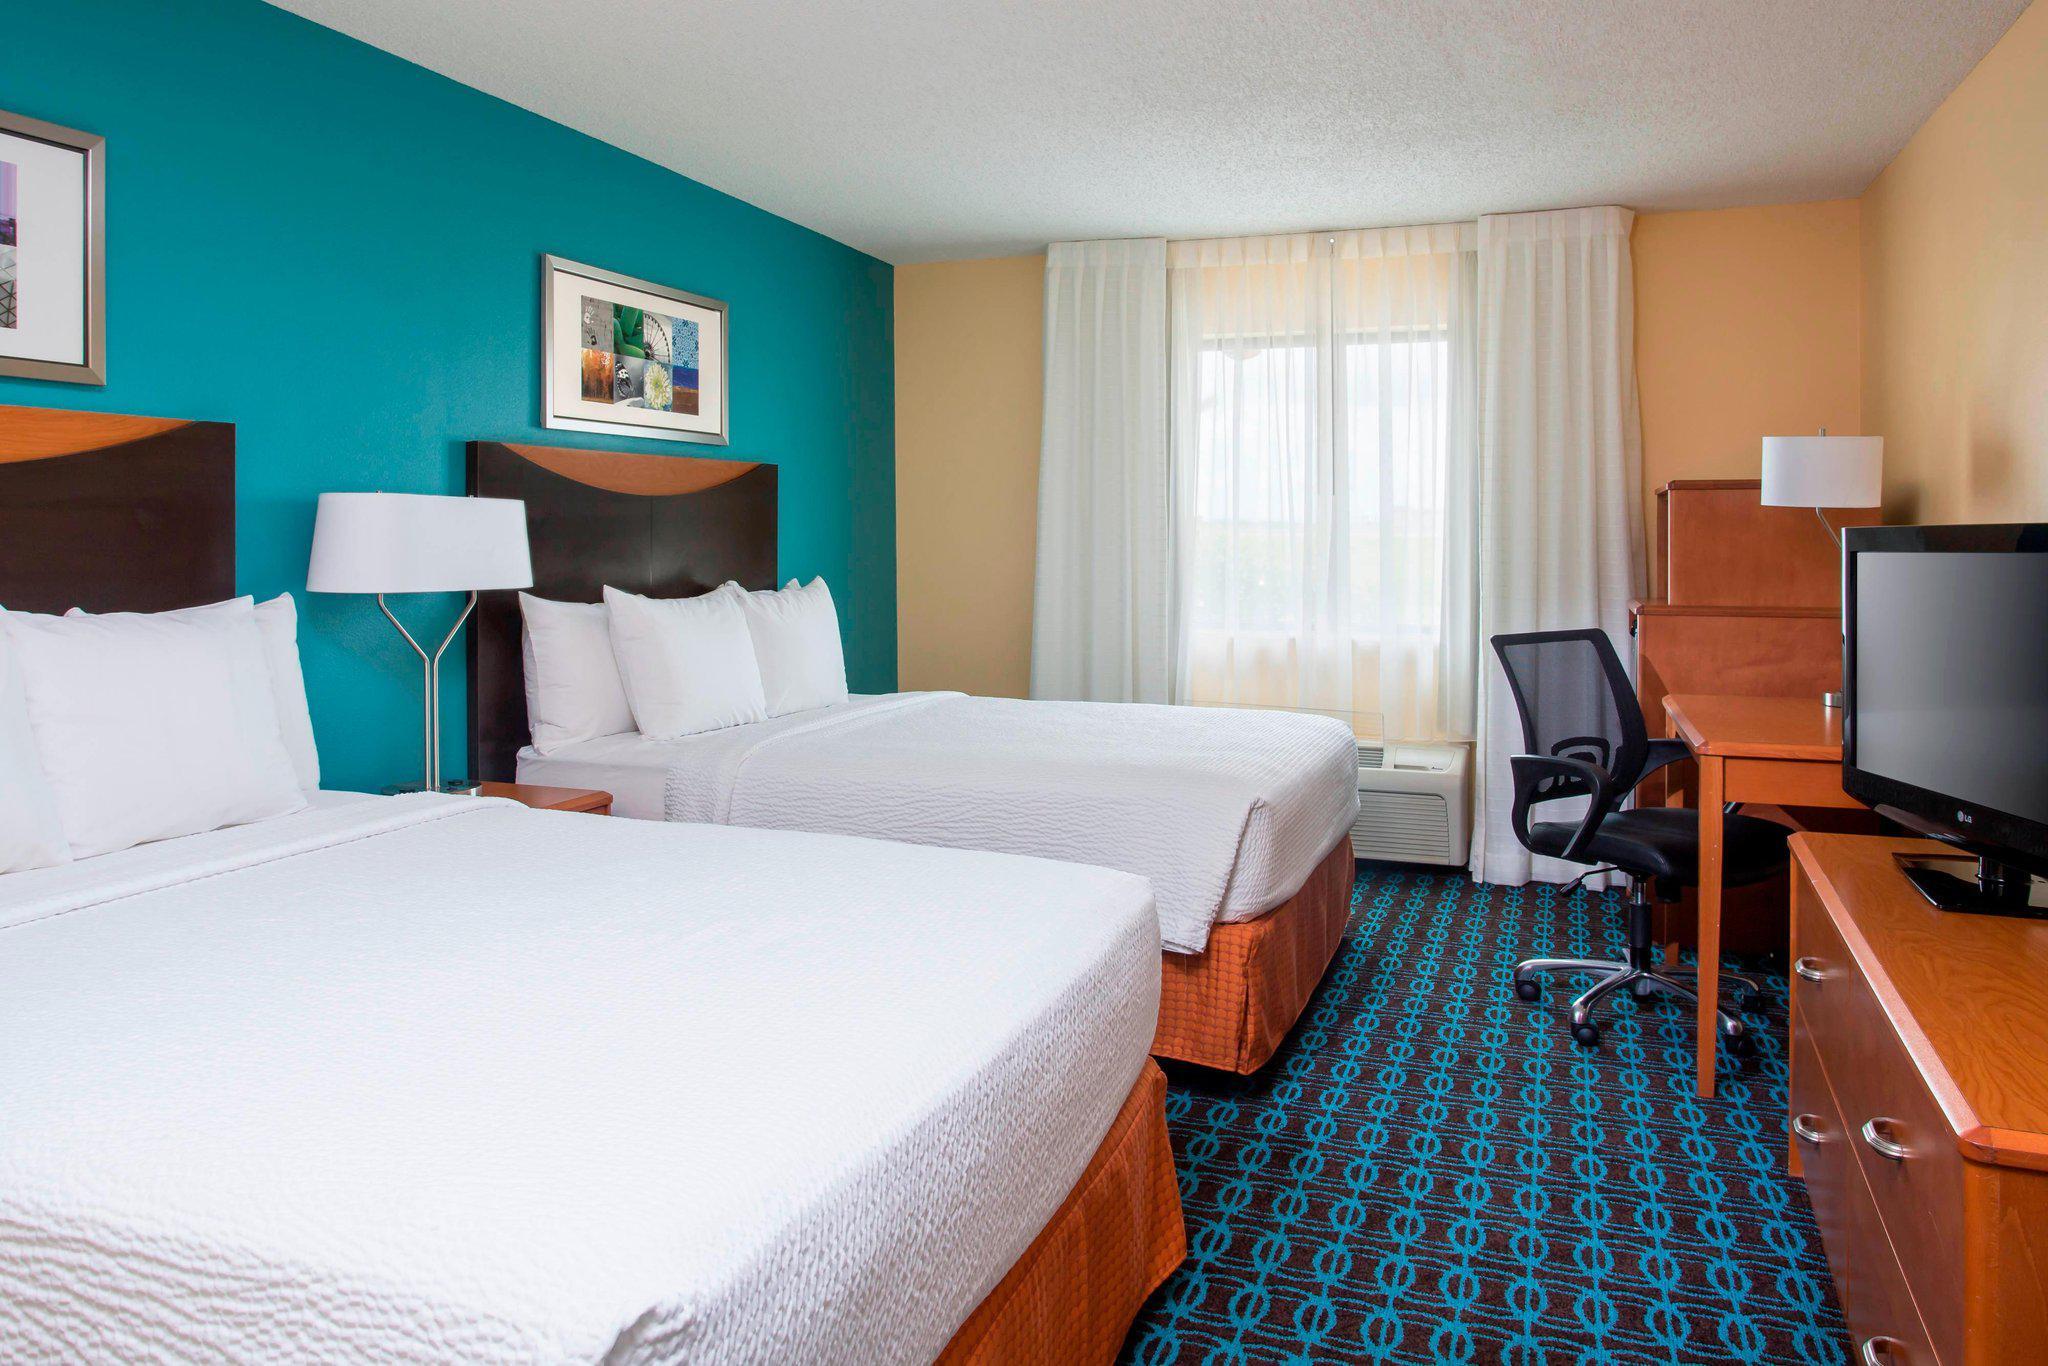 Fairfield Inn & Suites by Marriott Victoria